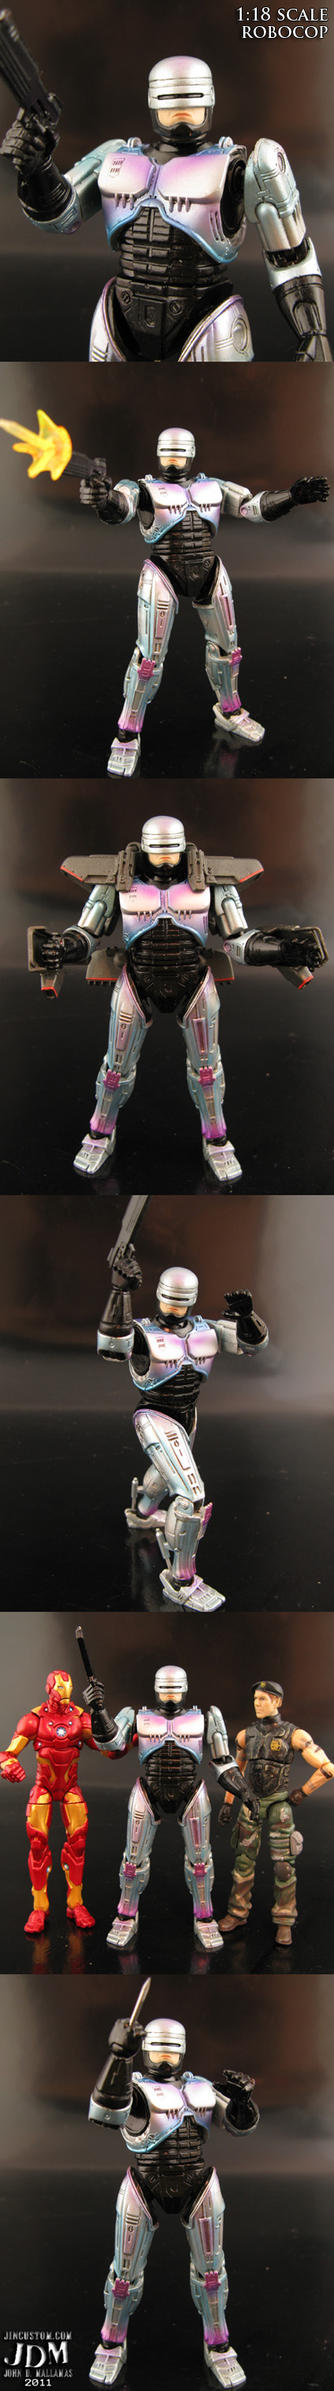 1:18 Robocop Figure by Jin-Saotome